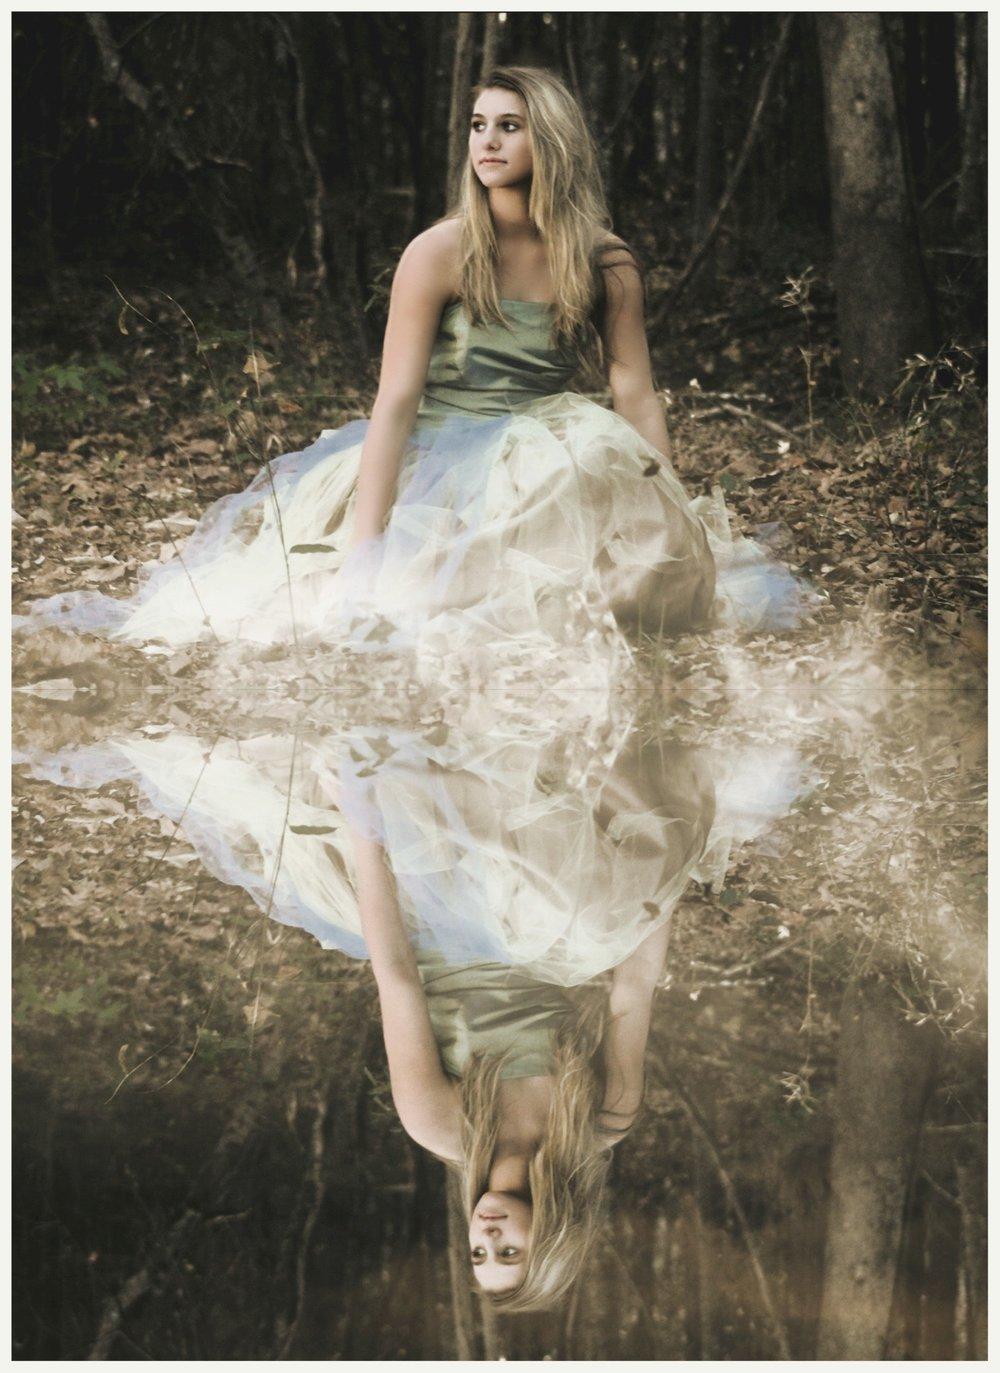 7d08d53d98 5 Ways to Use your Dress after Divorce-The Splendid Path